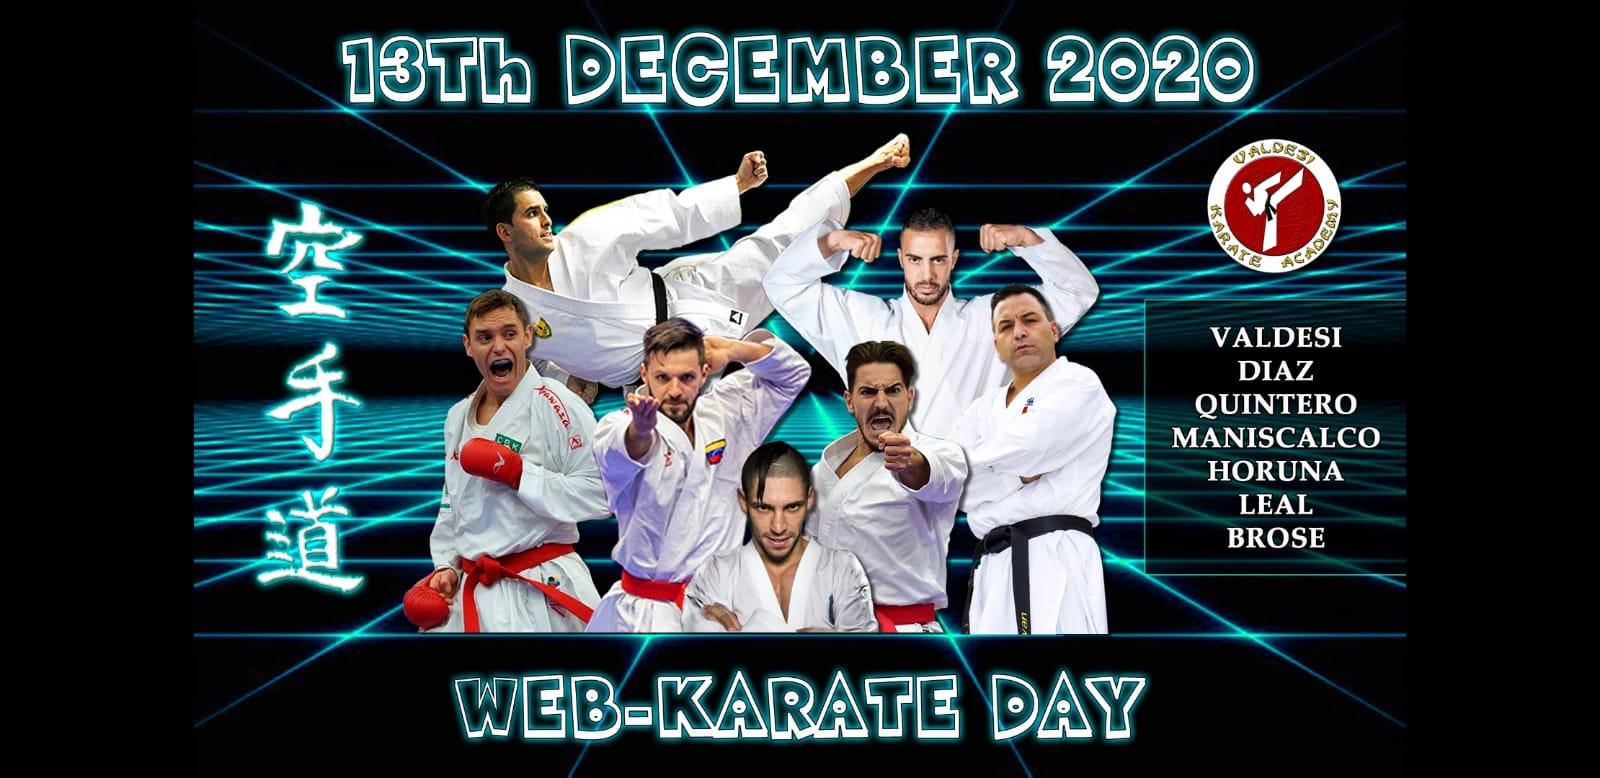 Web Karate Day - Session Kumite - Horuna